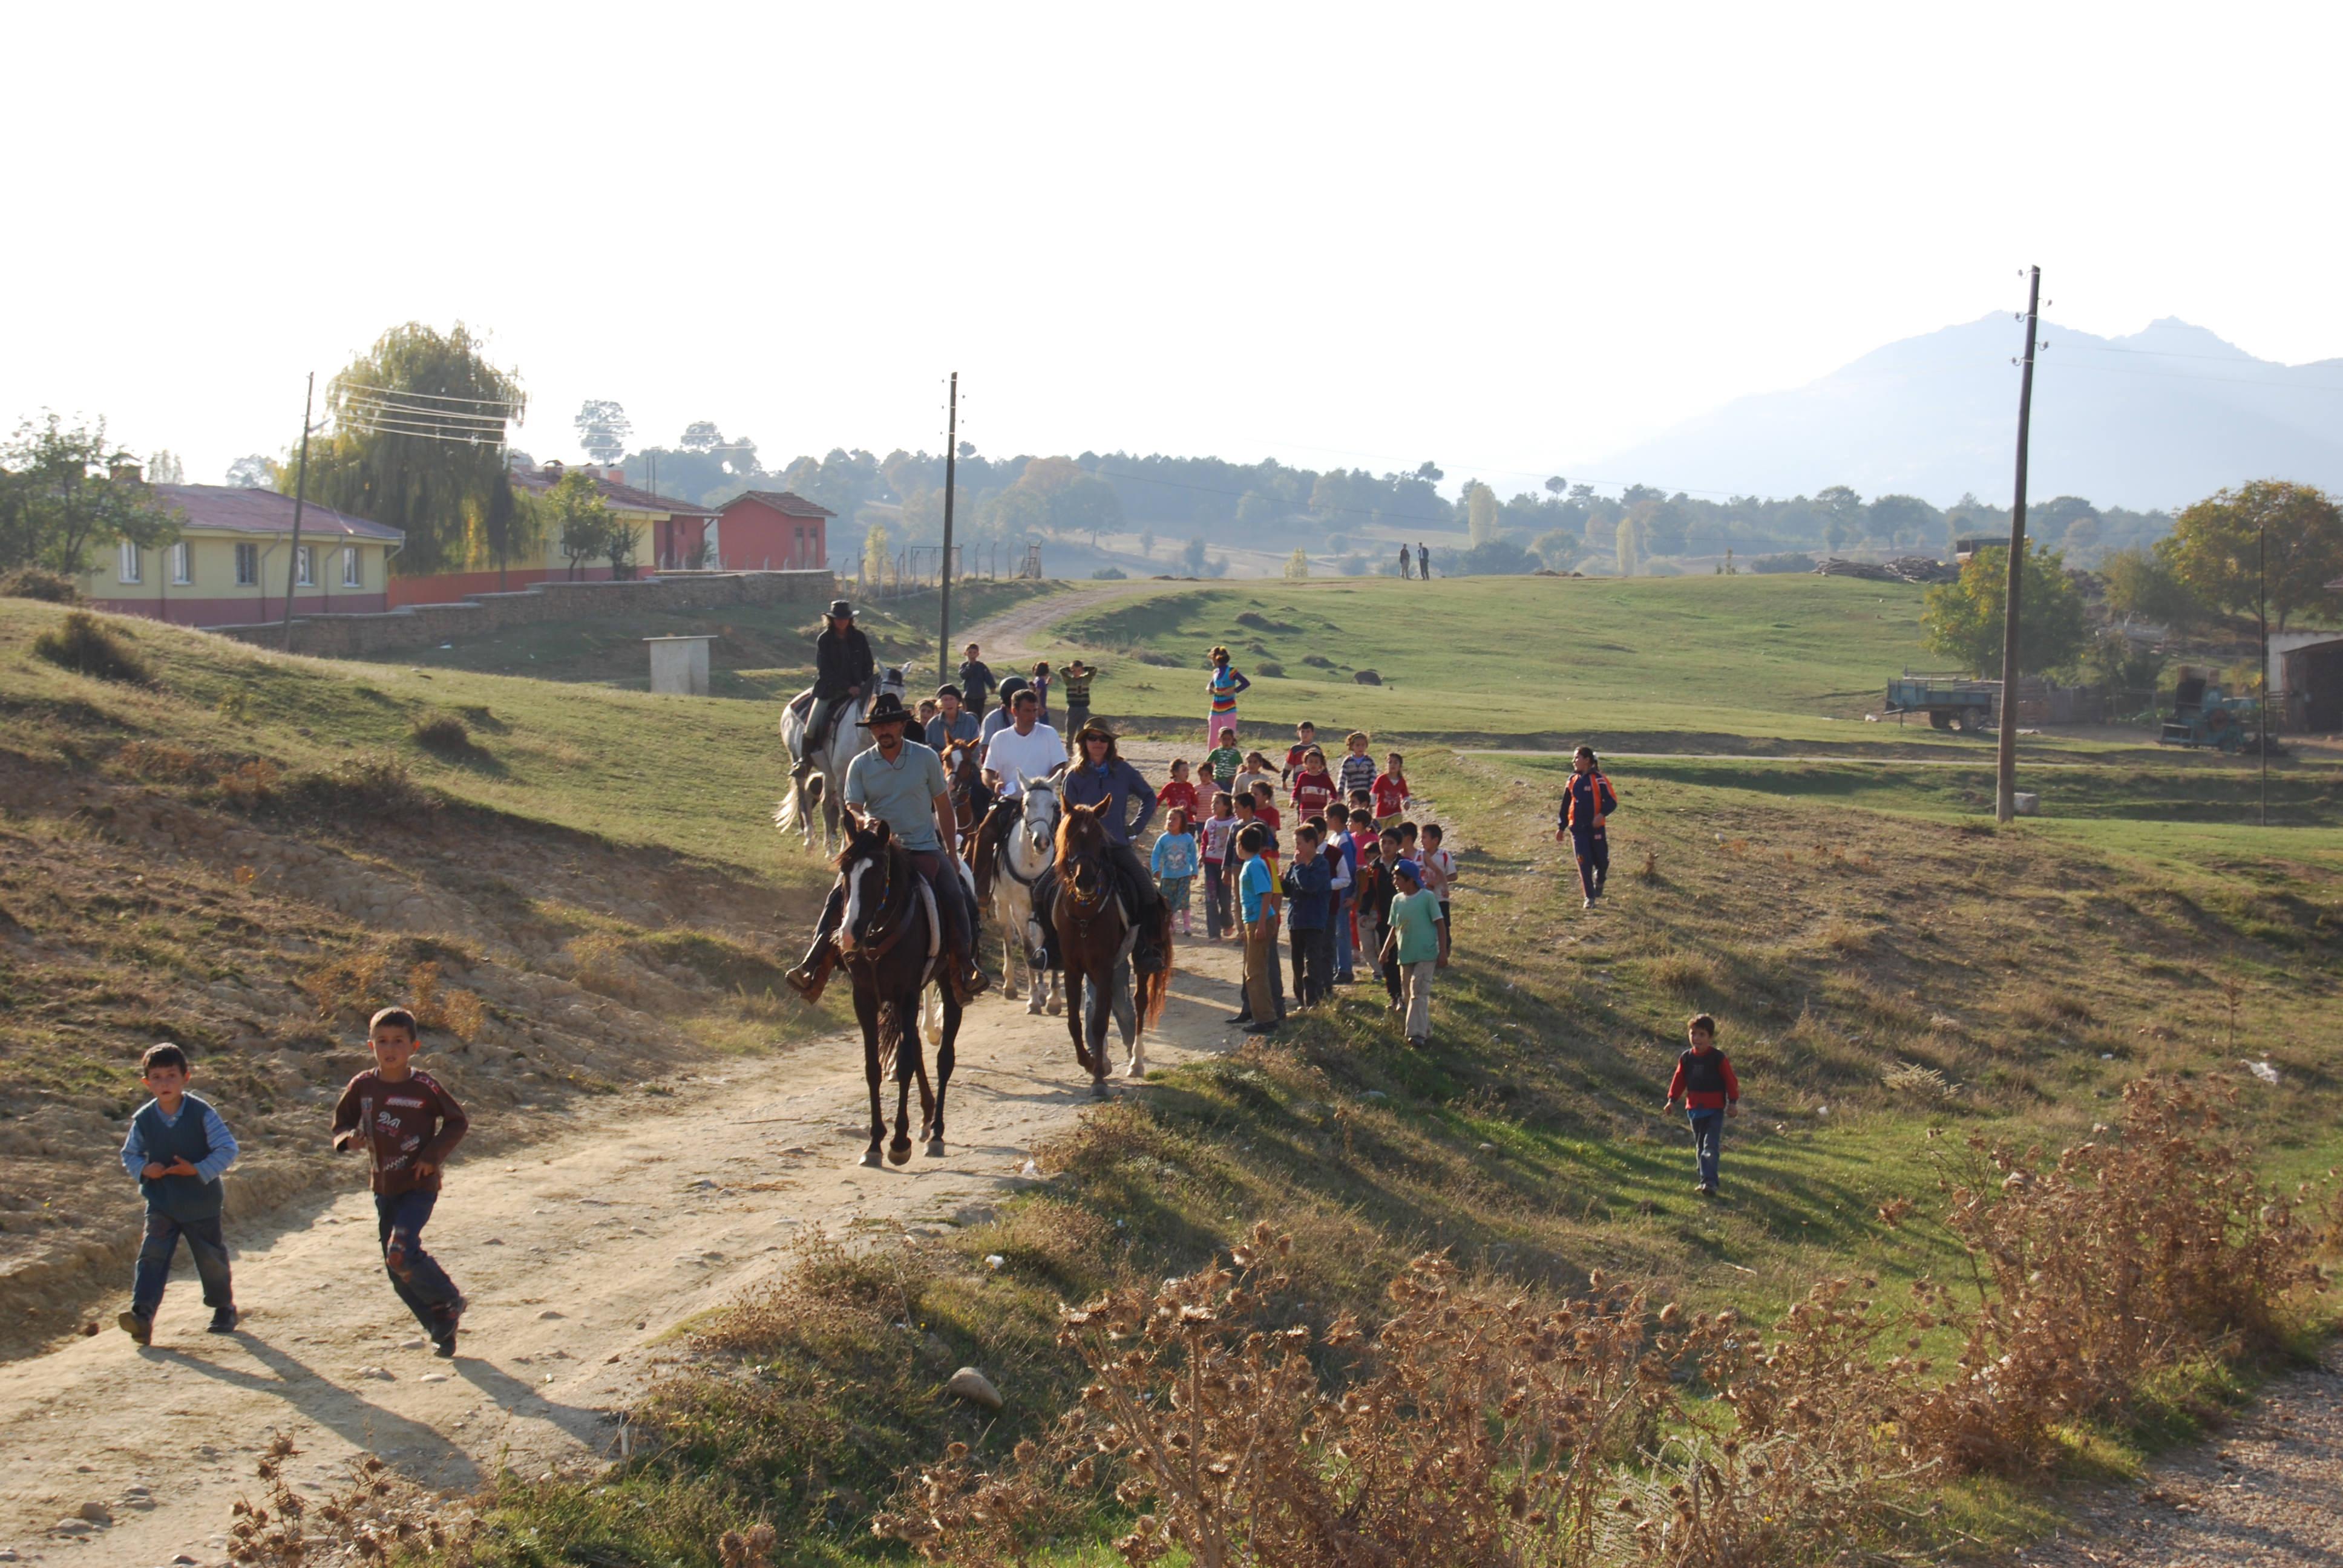 Riders along the Evliya Celebi Route in Turkey